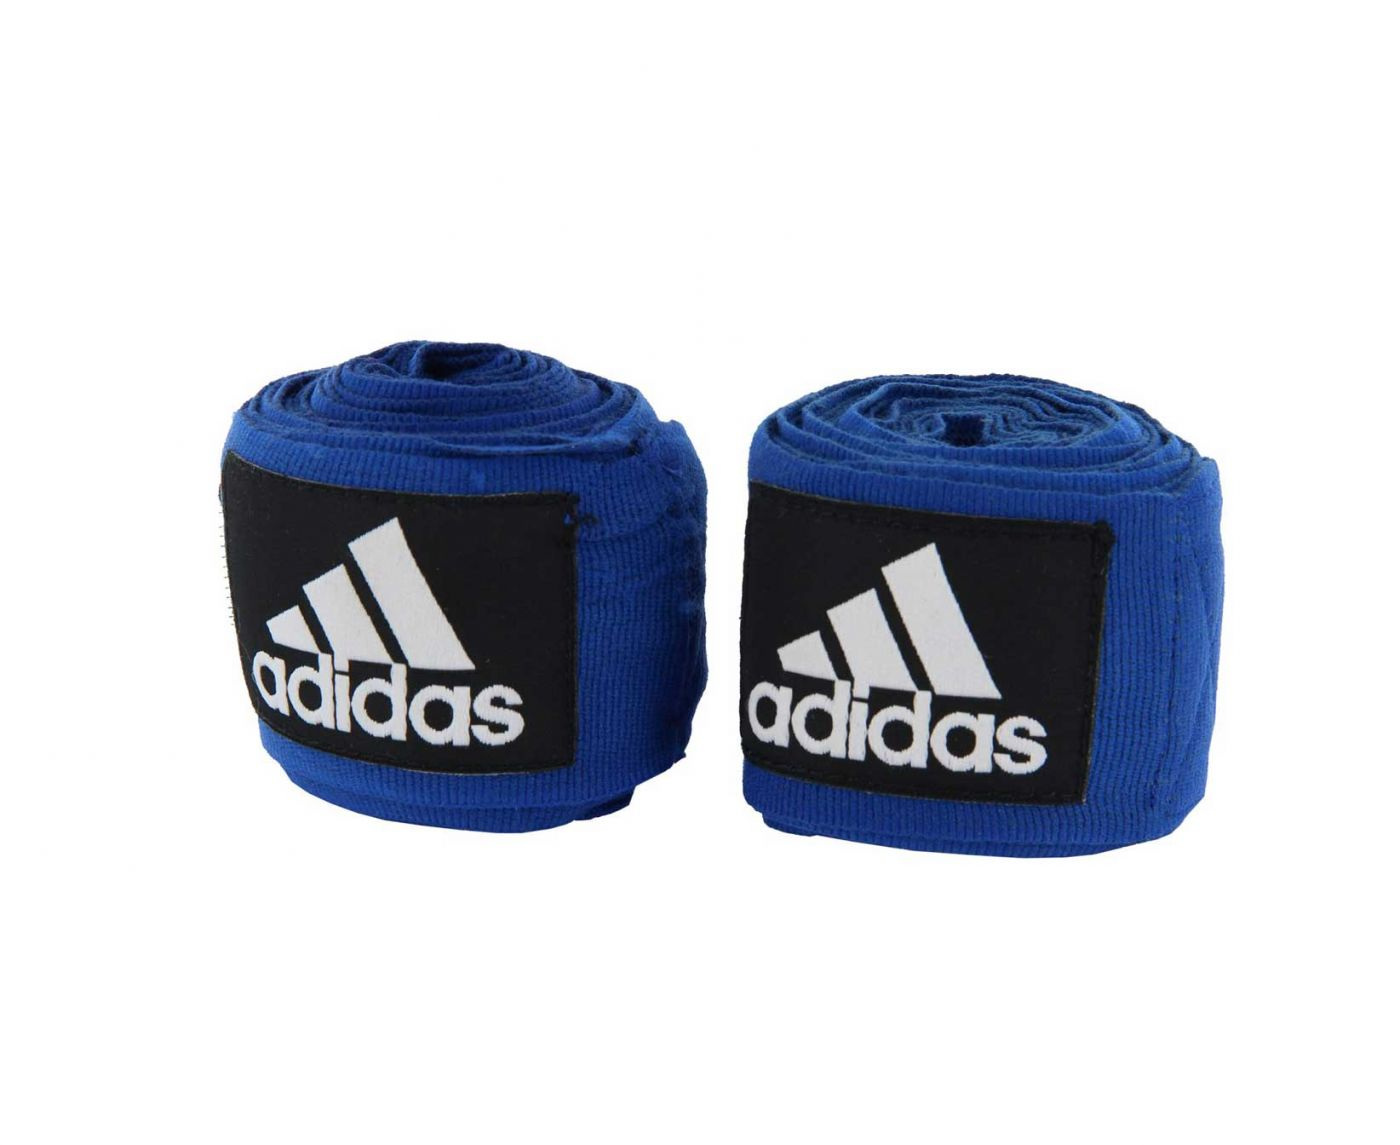 Бинты эластичные Adidas AIBA New Rules Boxing Crepe Bandage синие, 3.5м, adiBP031